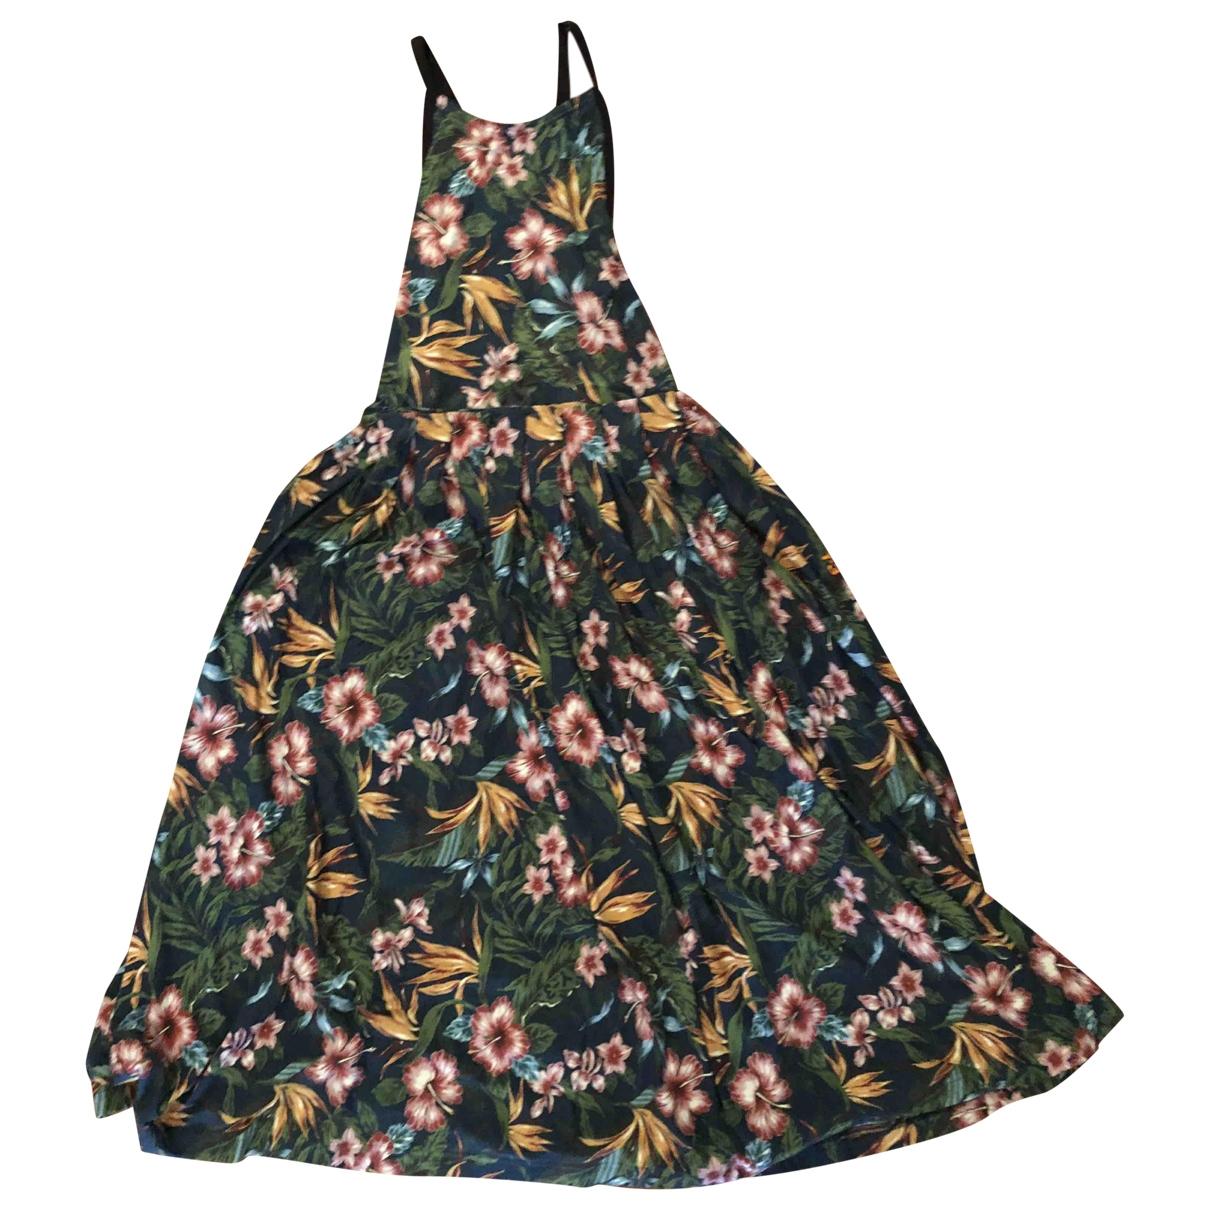 Y-3 - Robe   pour femme en coton - elasthane - multicolore